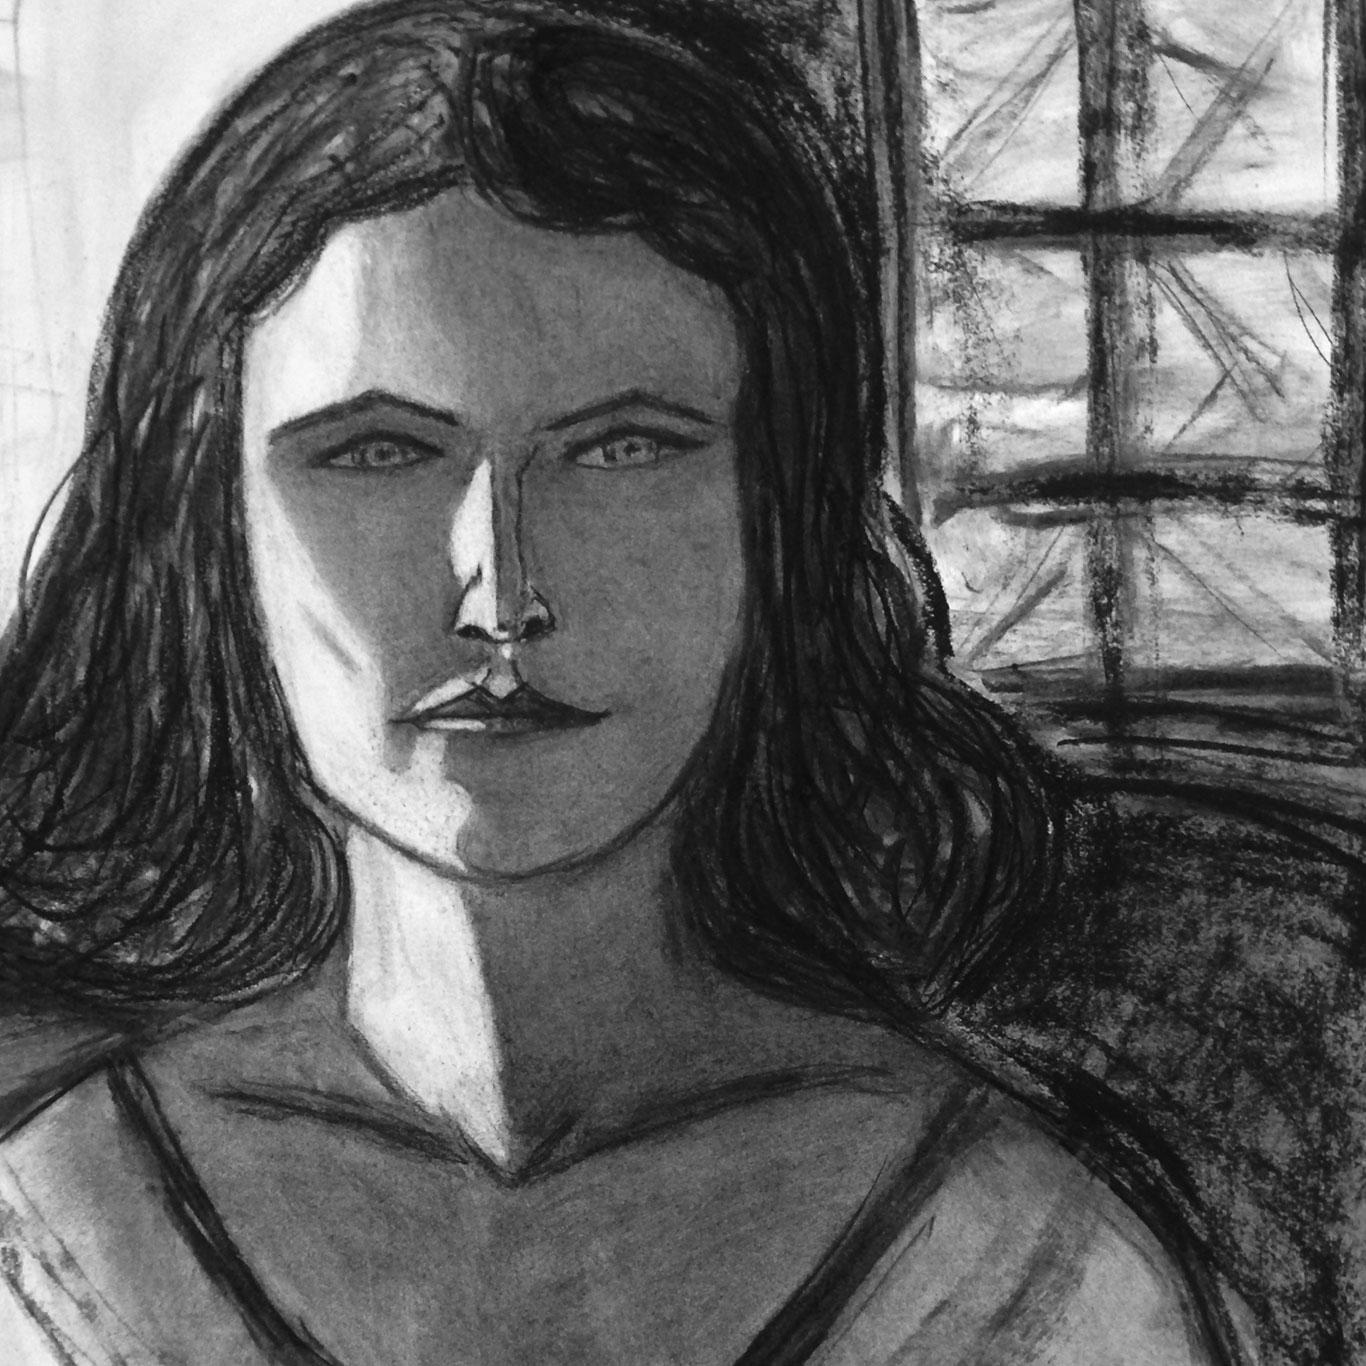 Charcoal Portrait Drawing by @bronwynne_art